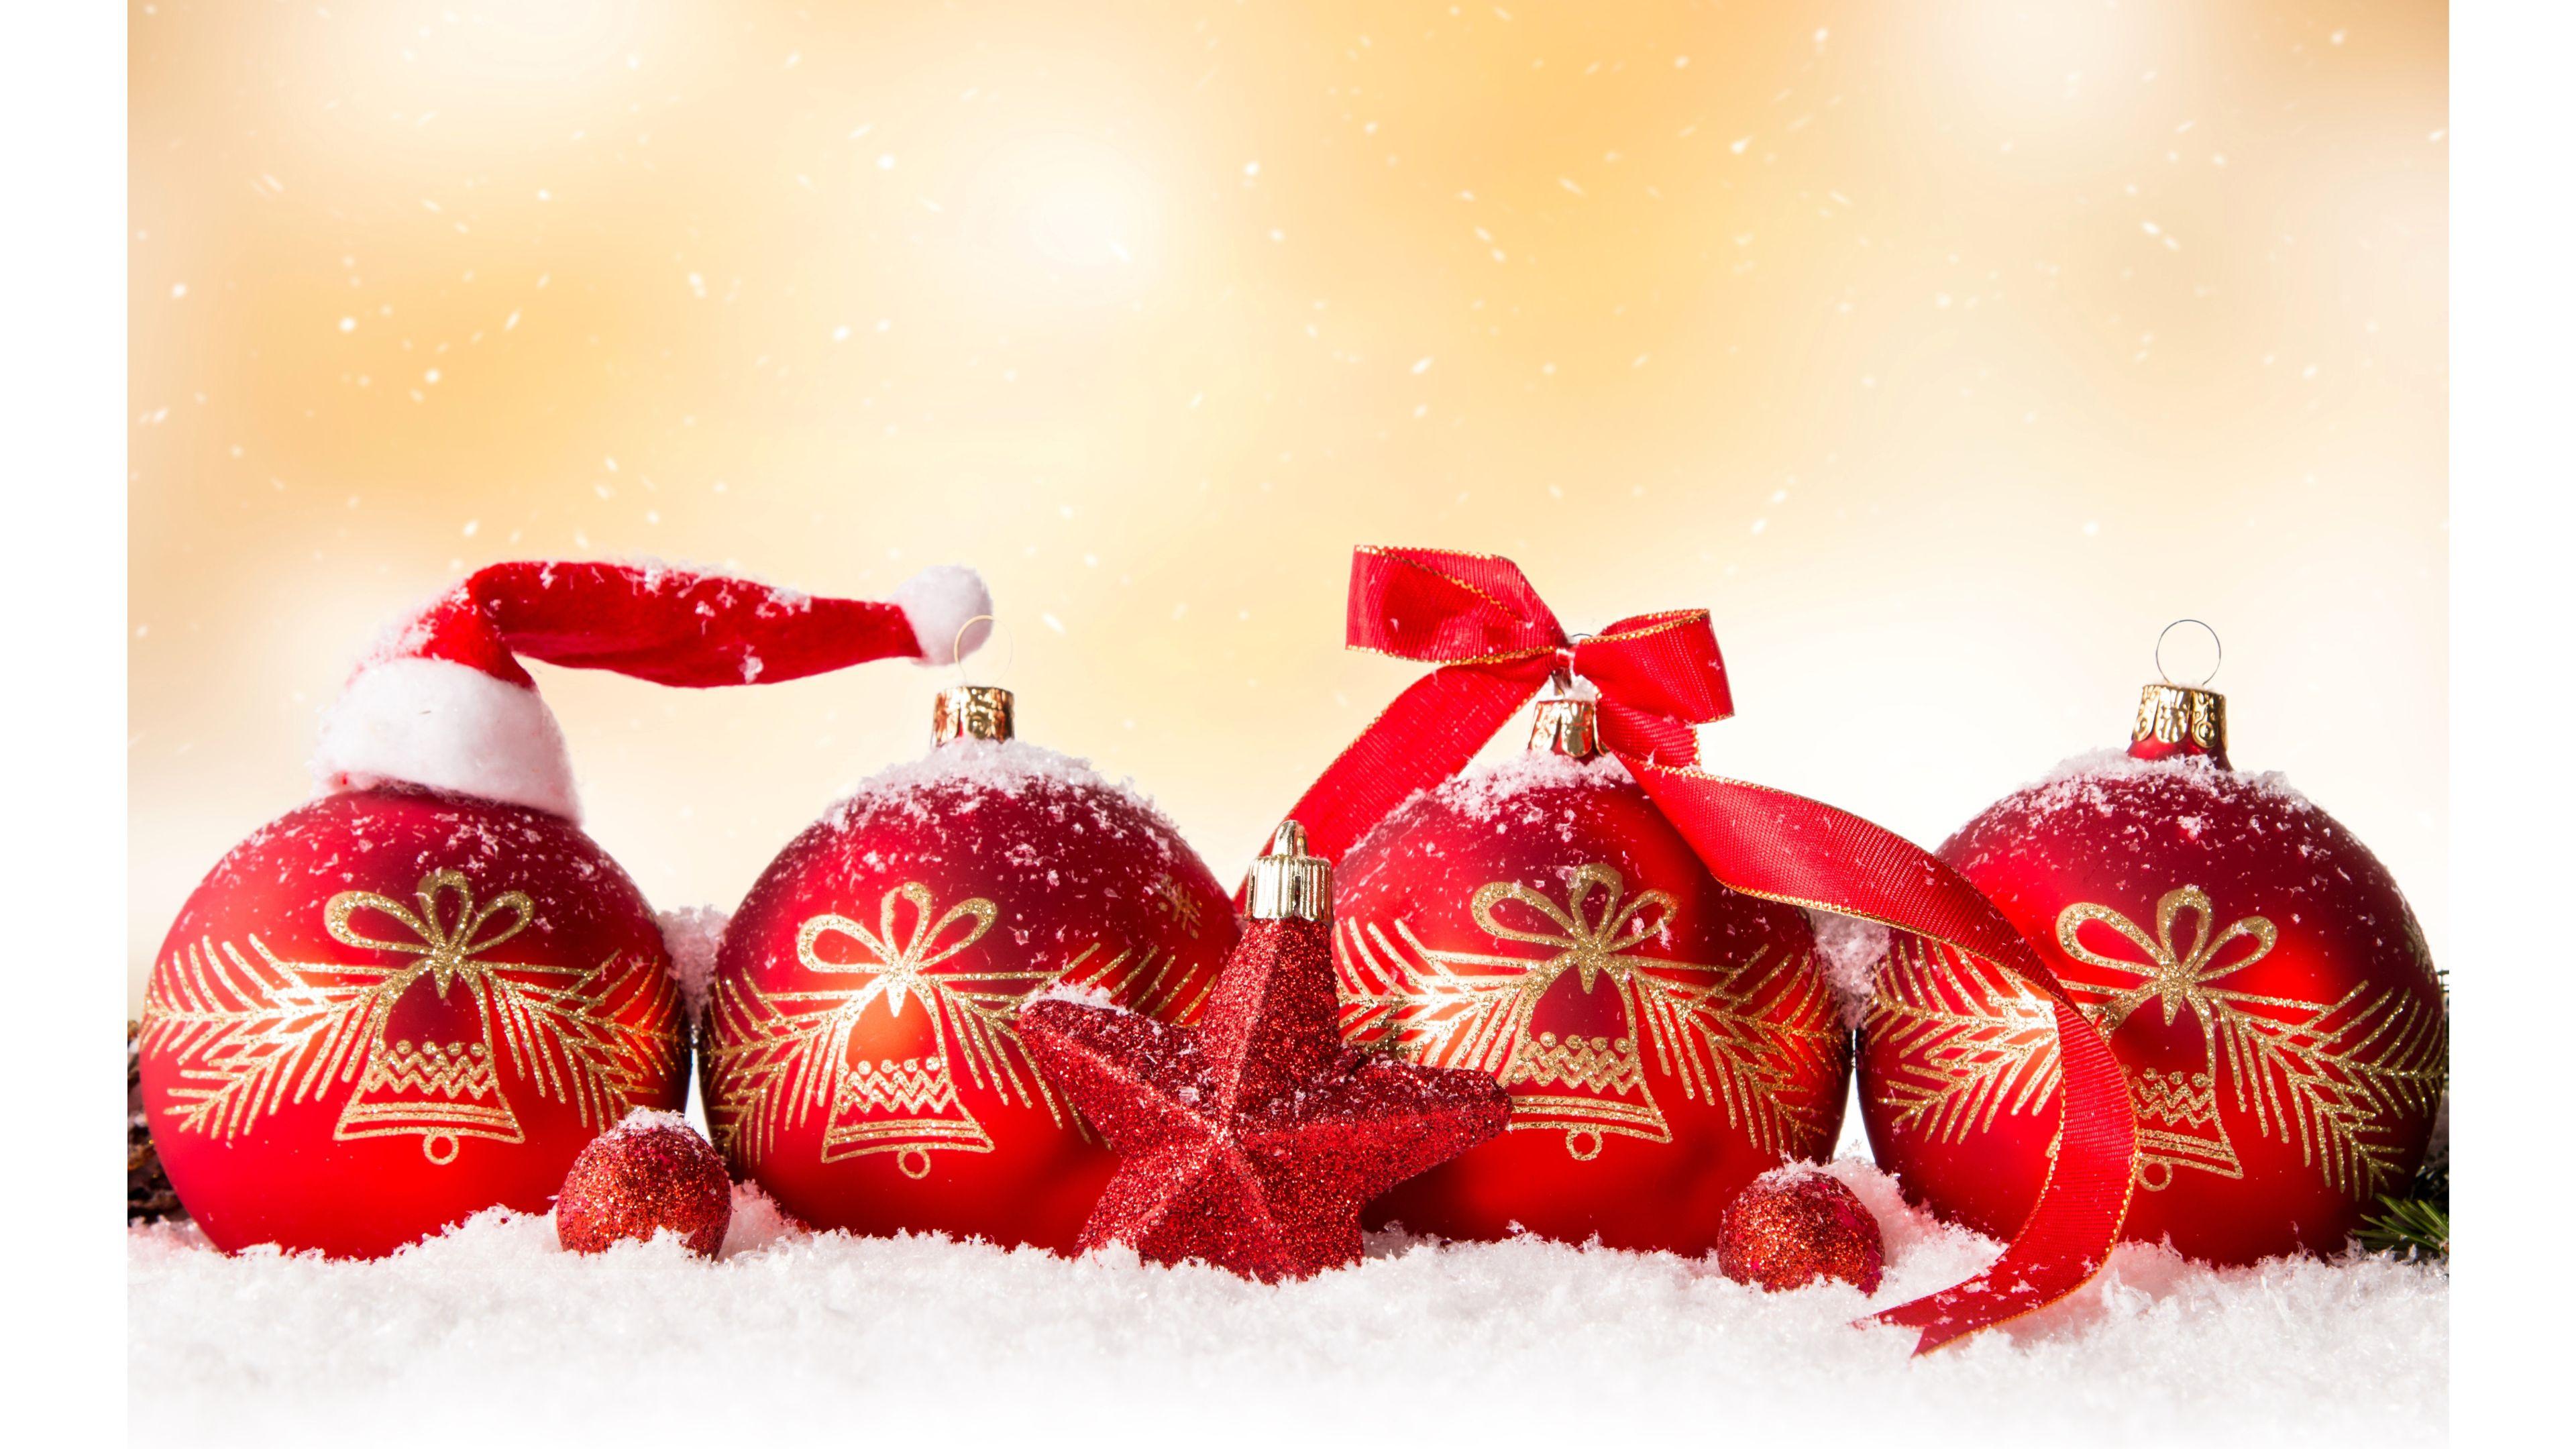 Red Ornament Merry Christmas 4K wallpaper 3840x2160